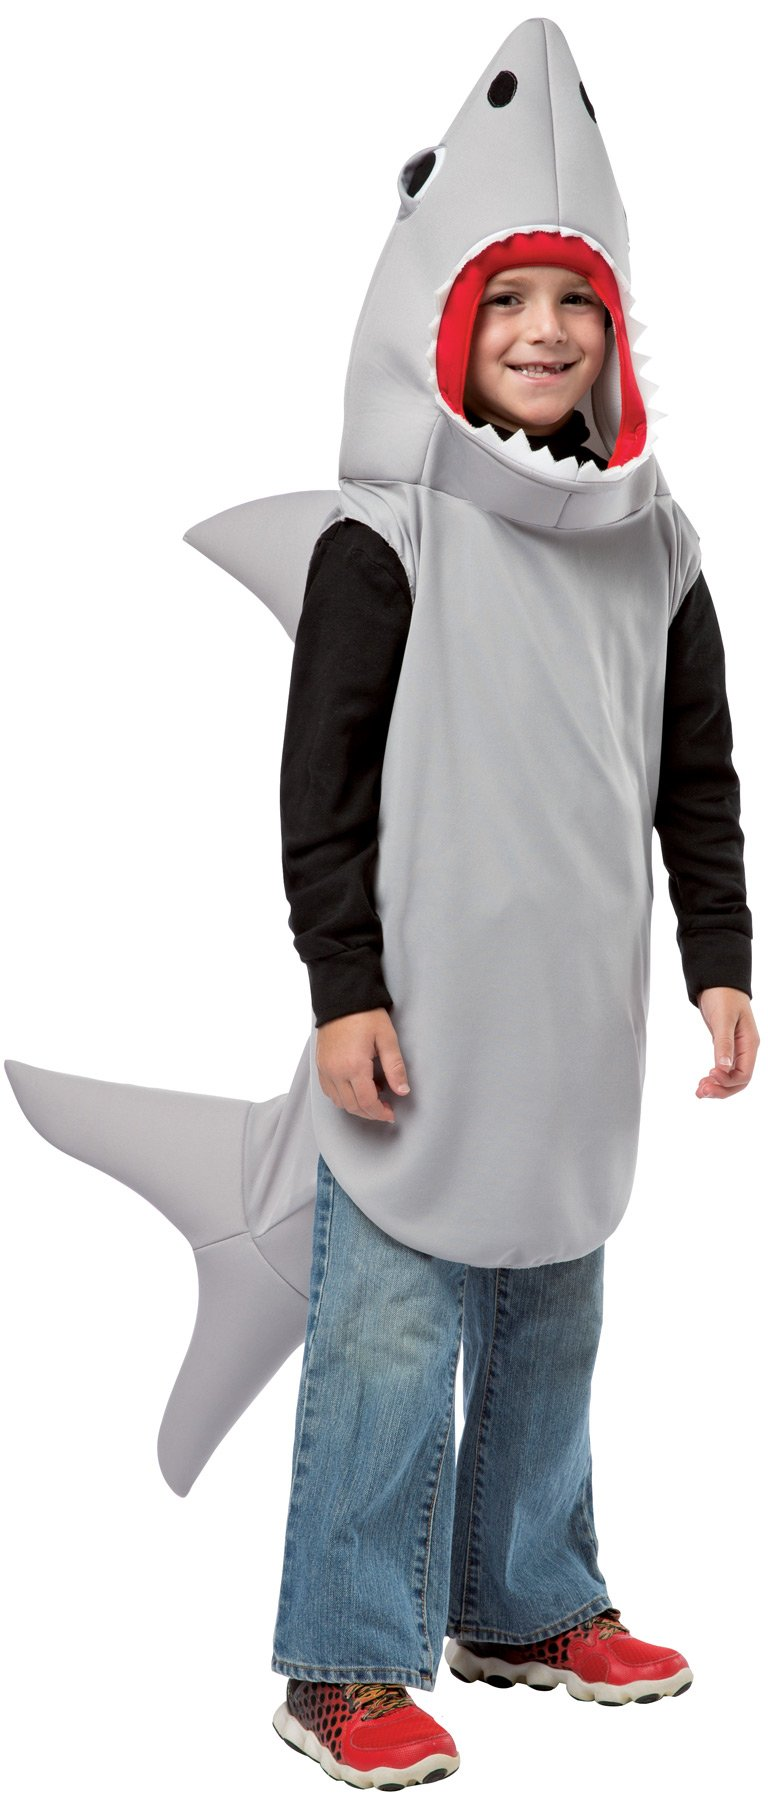 UHC Boy's Sand Shark Fancy Dress Safari Fish Theme Child Halloween Costume, M (7-10)